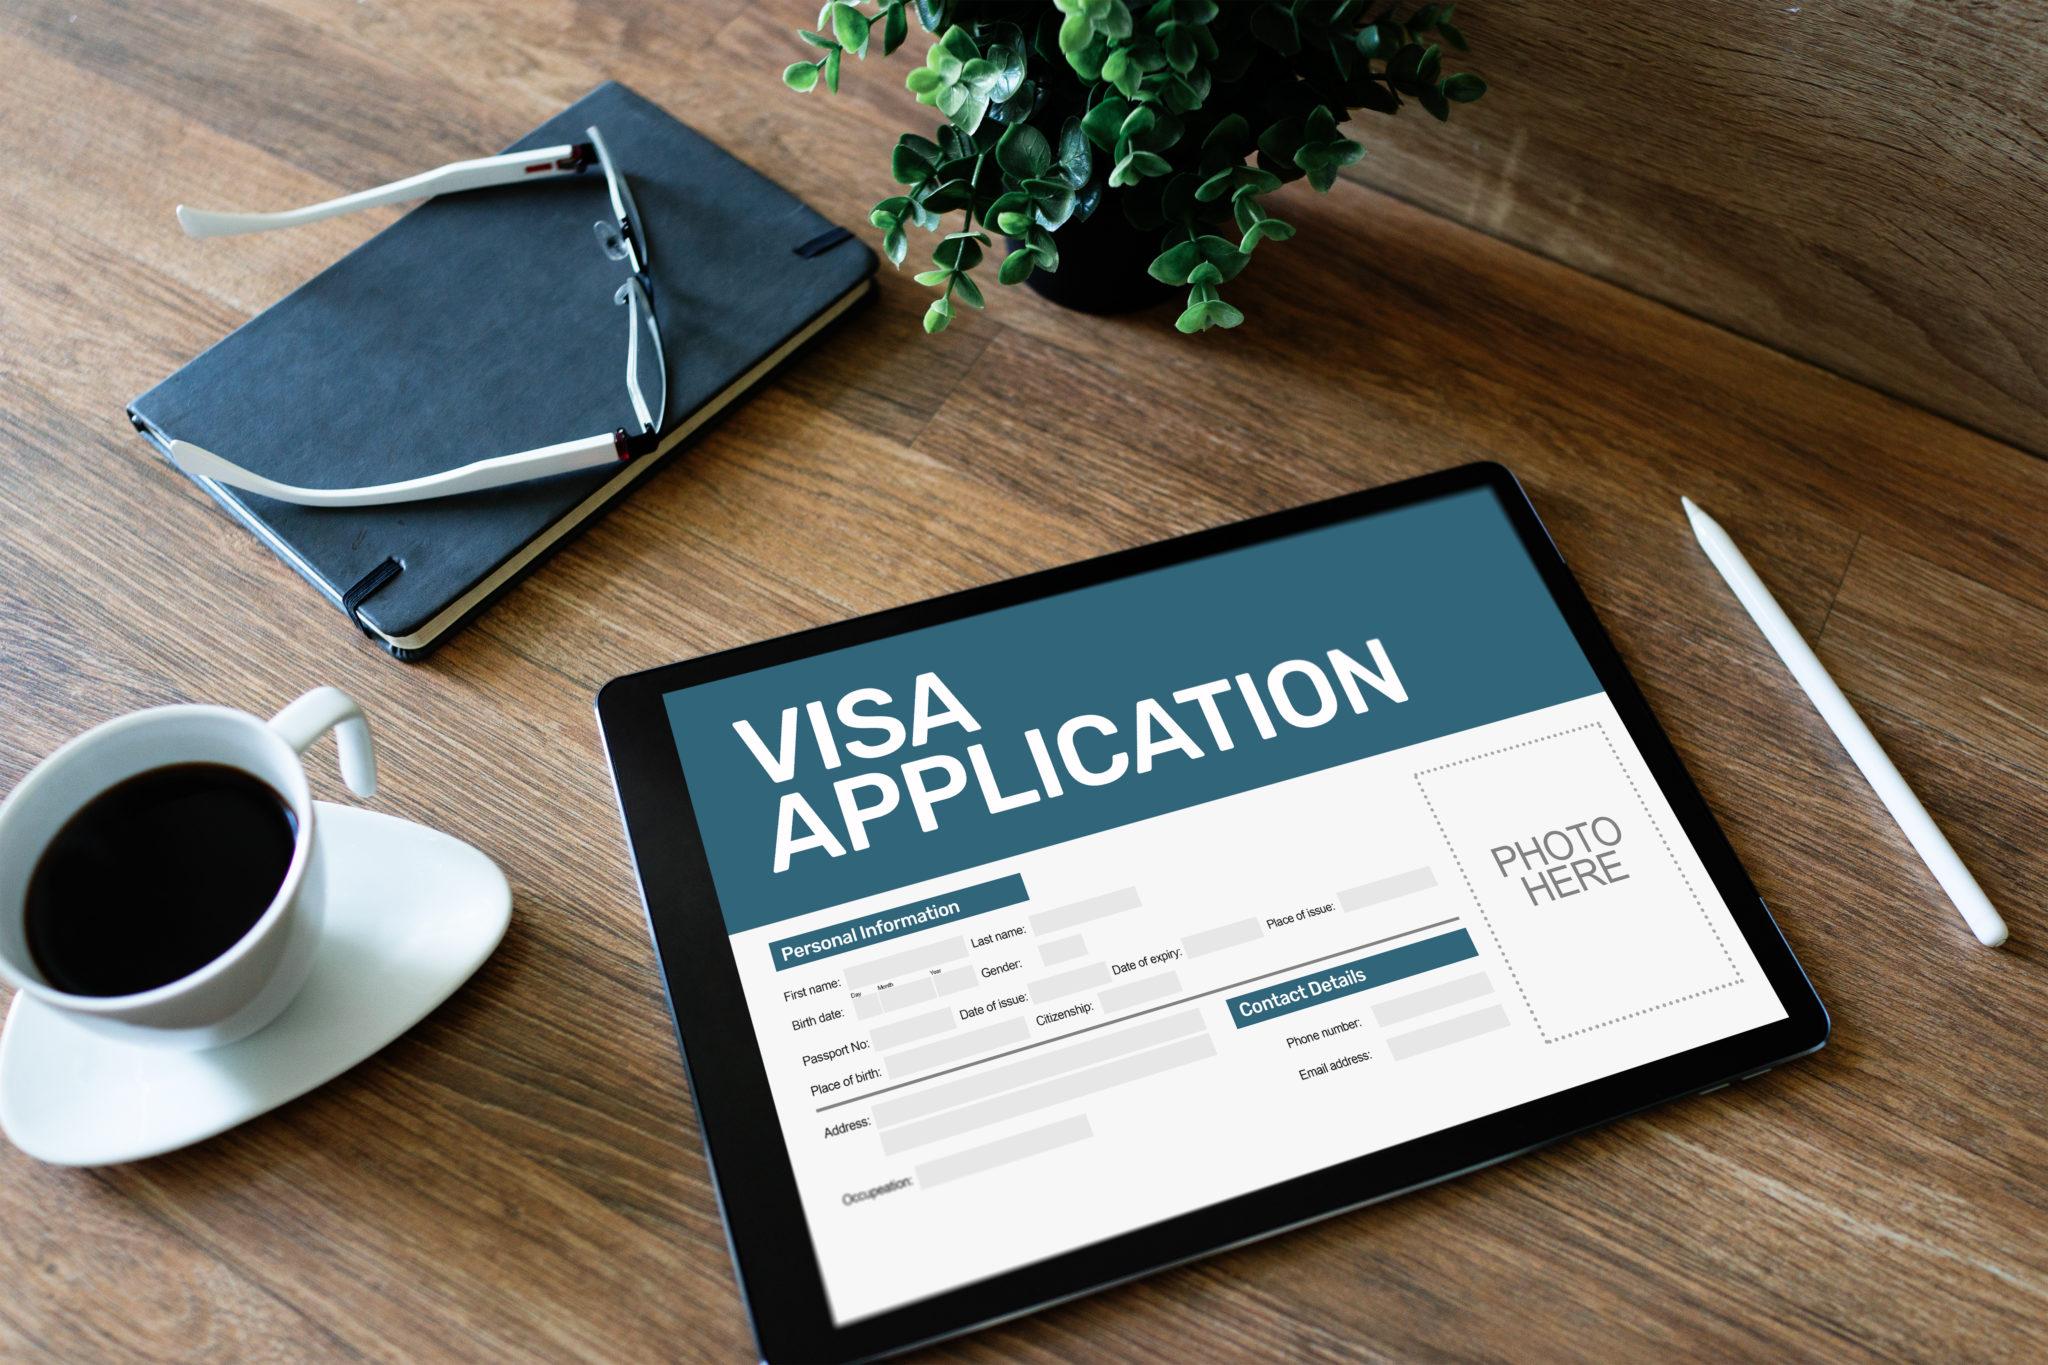 2. L-1 Visas - Dallas Immigration Attorney